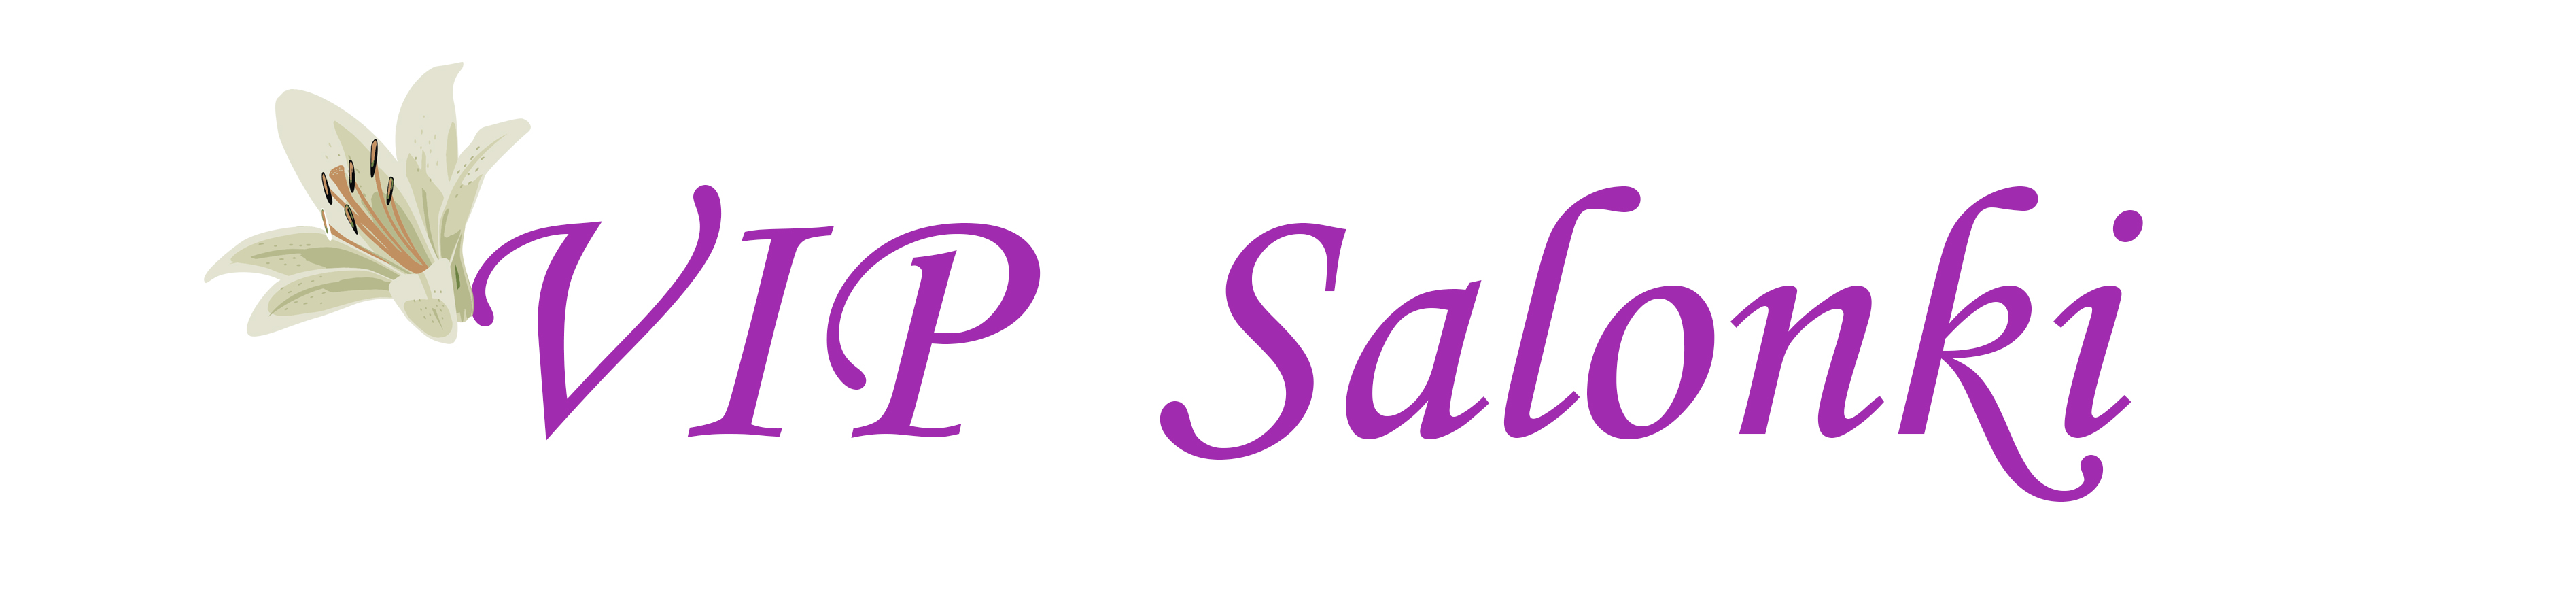 VIP Salonki